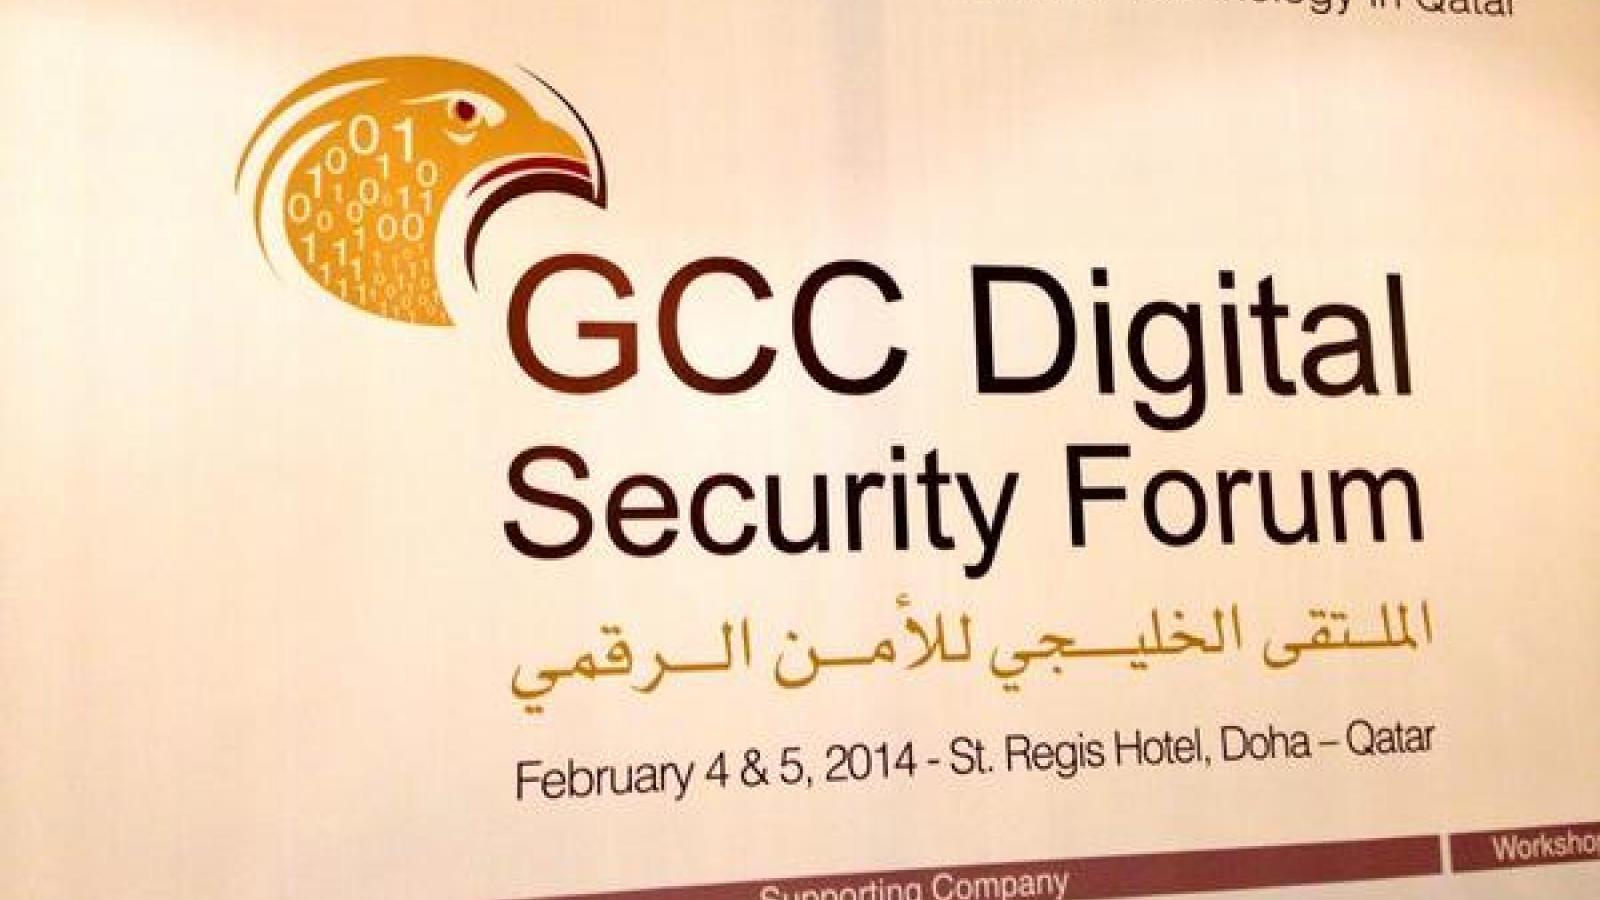 Top experts meet in Doha for GCC Digital Security Forum